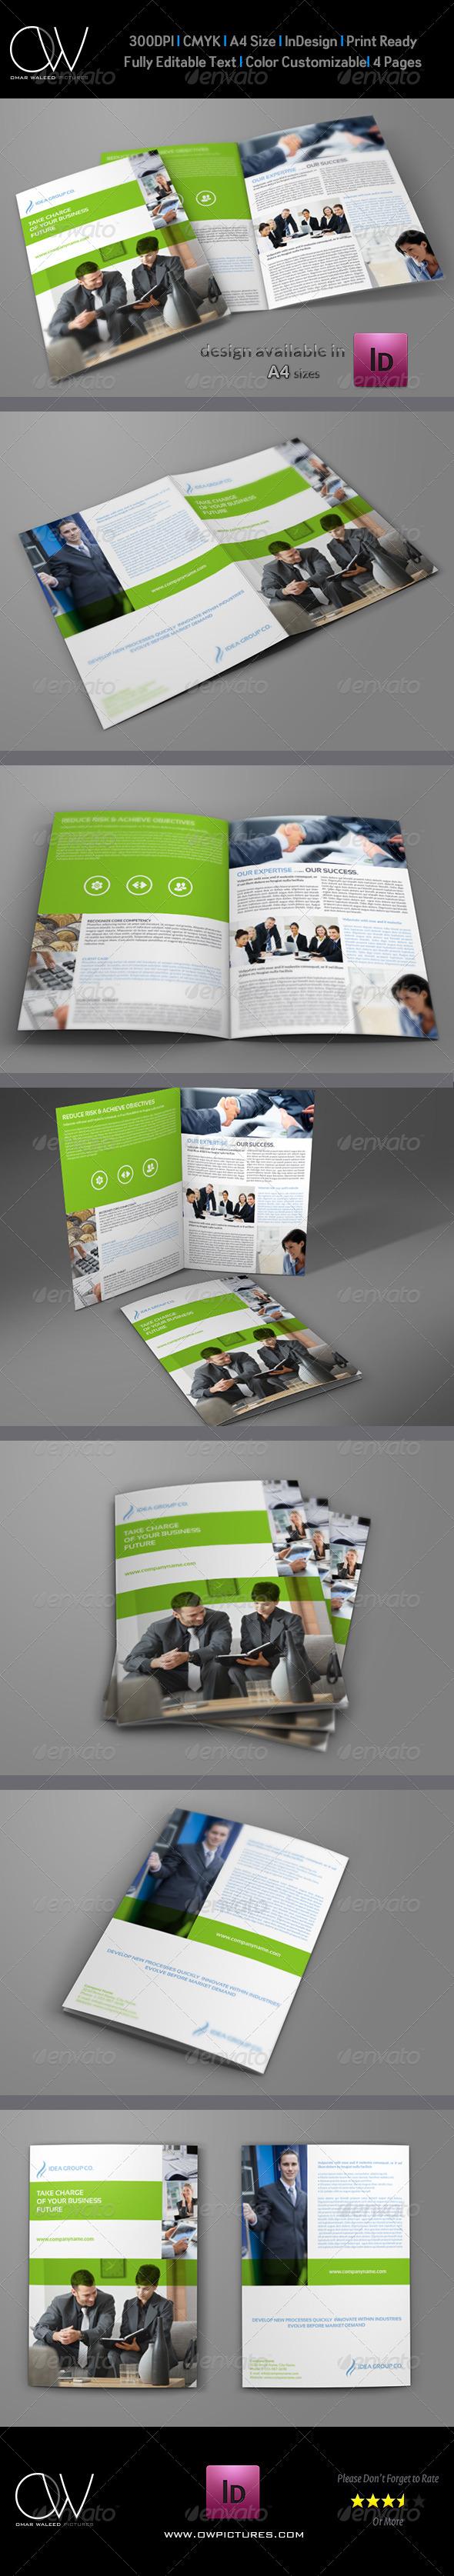 Company Brochure Bi-Fold Template Vol.19 - Corporate Brochures